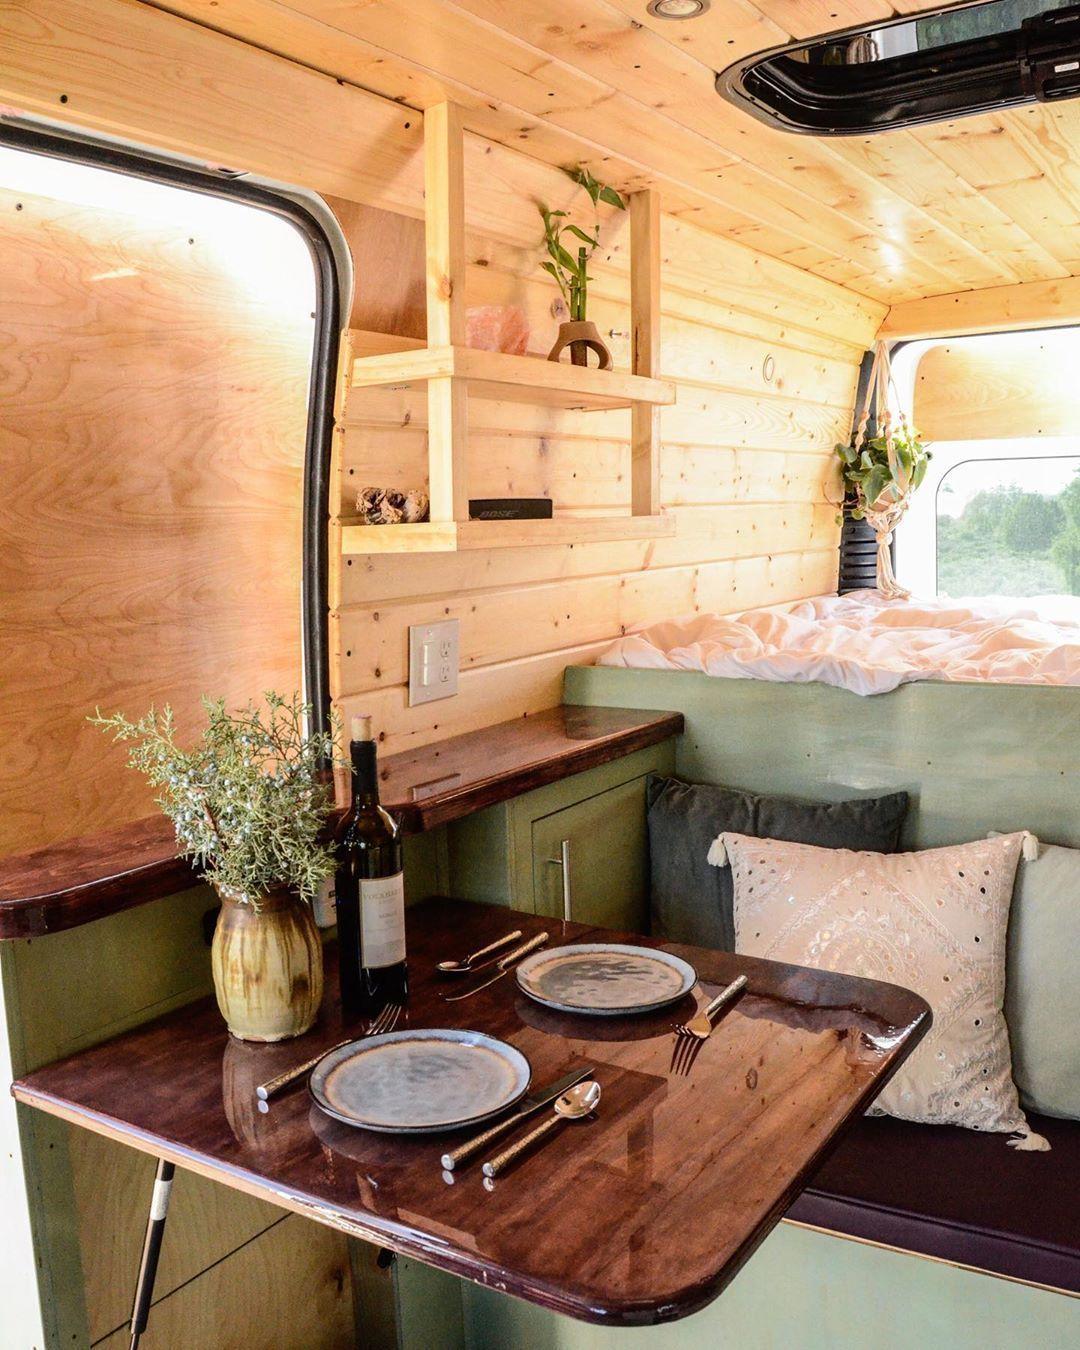 "Photo of Stinson Vans on Instagram: ""Looking for your dream van? Let me build a van li…,  #Build #dr…"